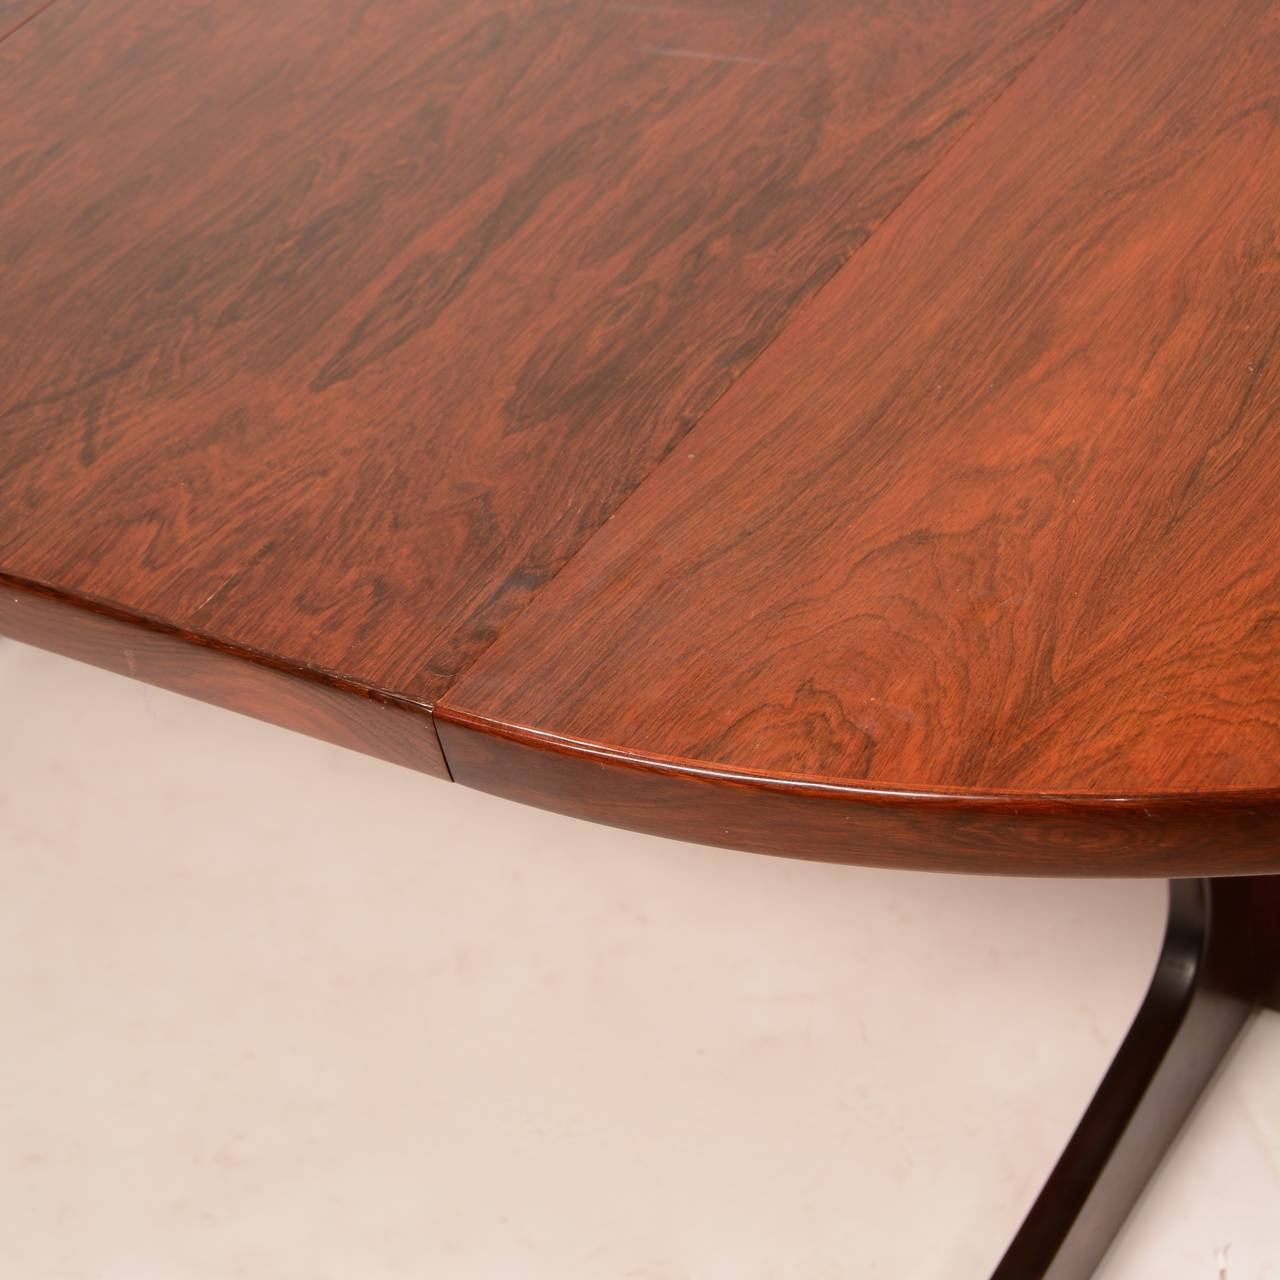 Mid-Century Modern Skovmand & Andersen for Moreddi Rosewood Dining Table 8